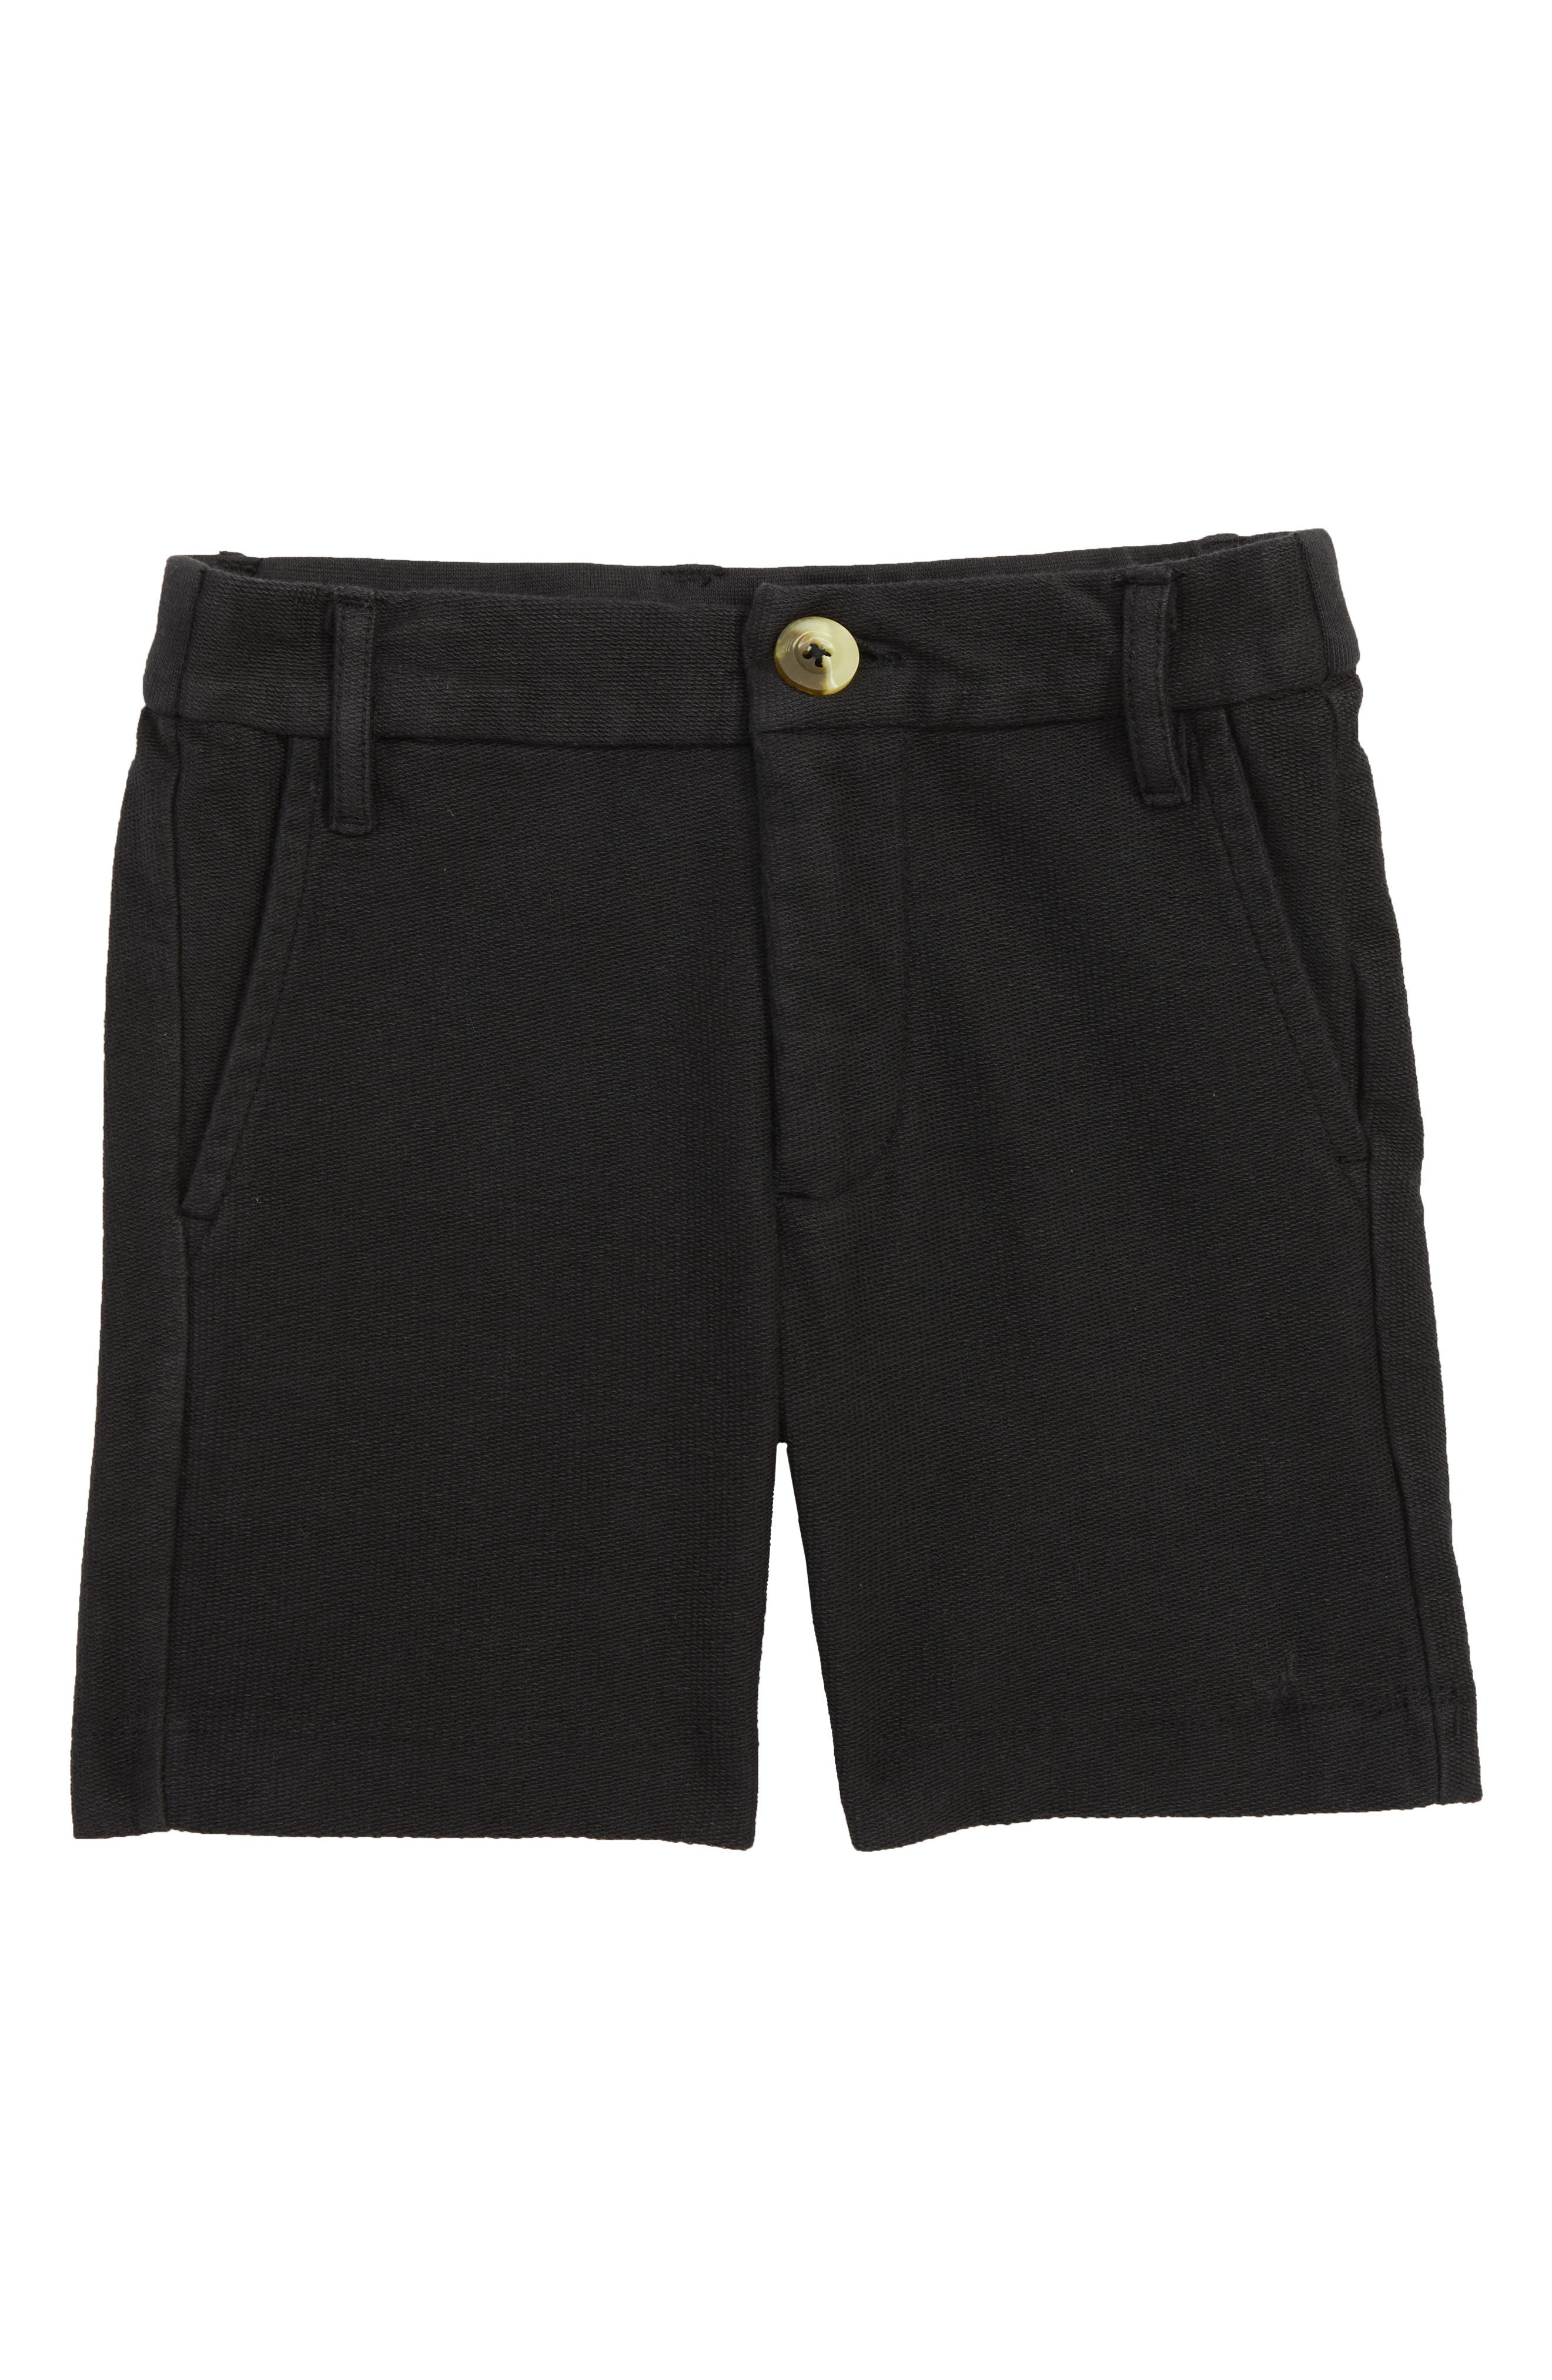 Easton Short,                         Main,                         color, Black